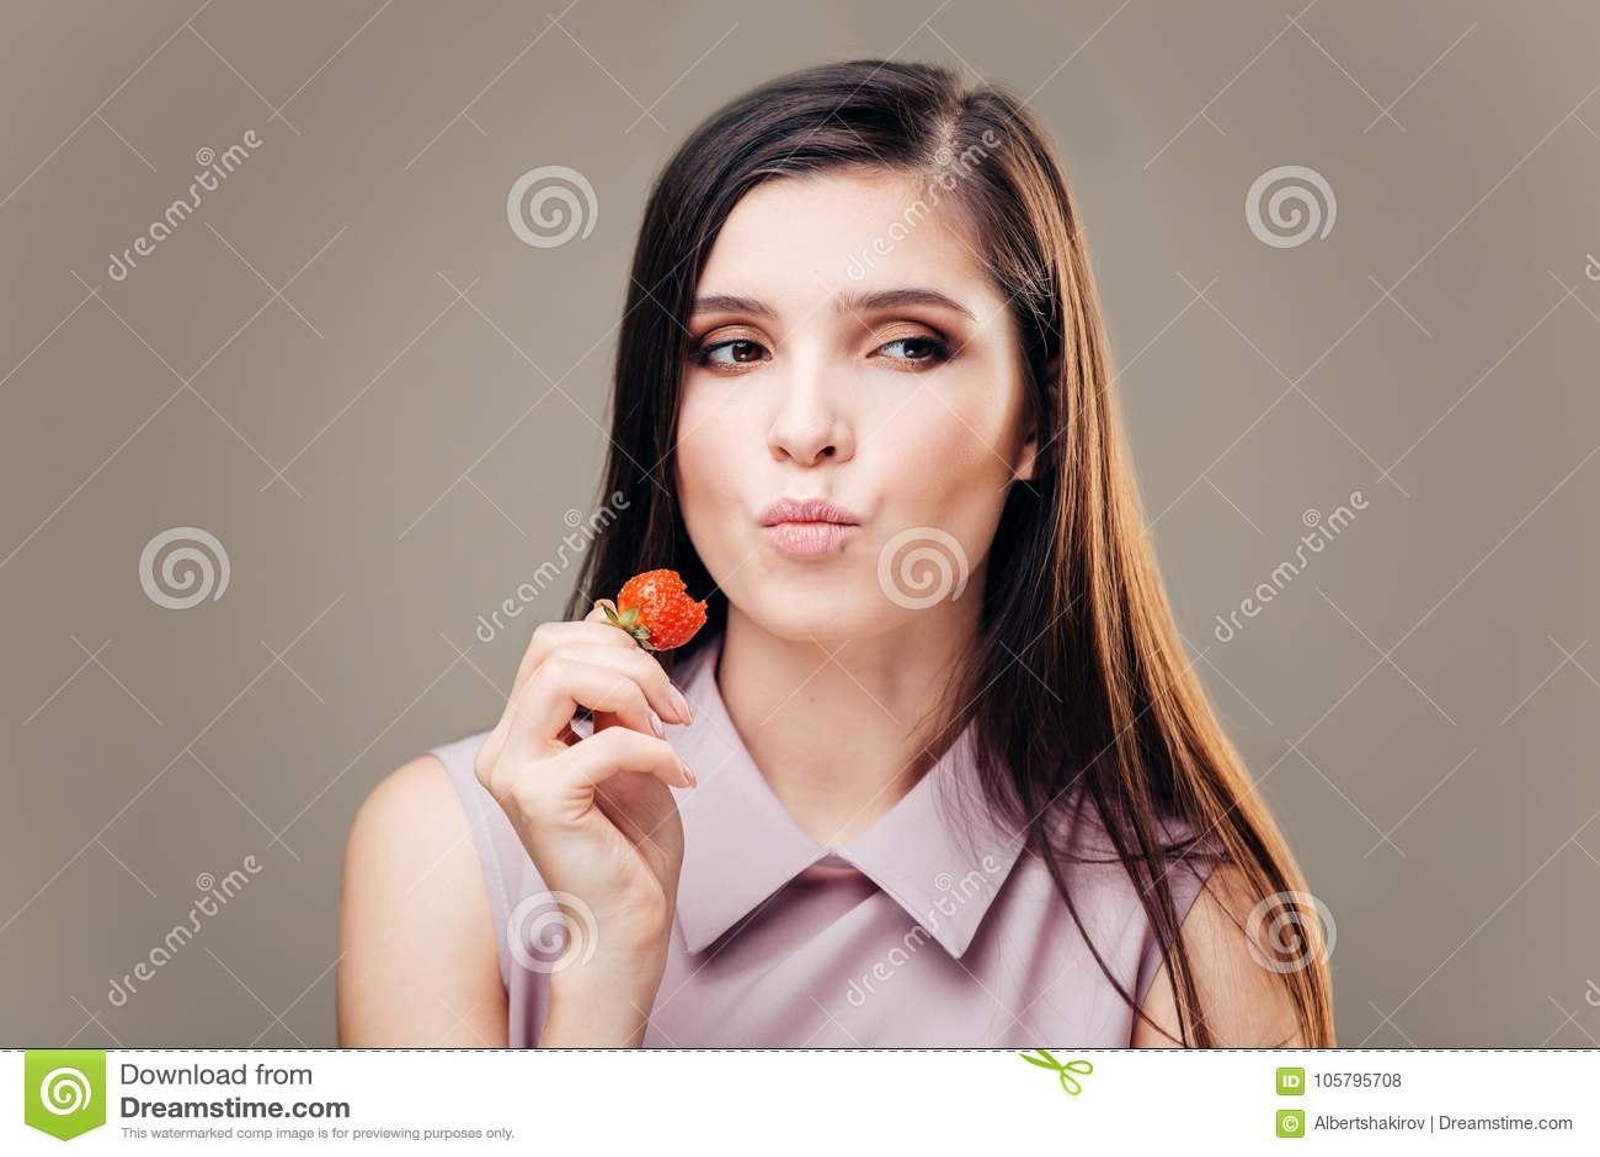 1ba8db49bd54e Woman eating strawberries. Healthy happy smiling woman eating strawberry.  Gorgeous smile on mixed Caucasian Asian female model.